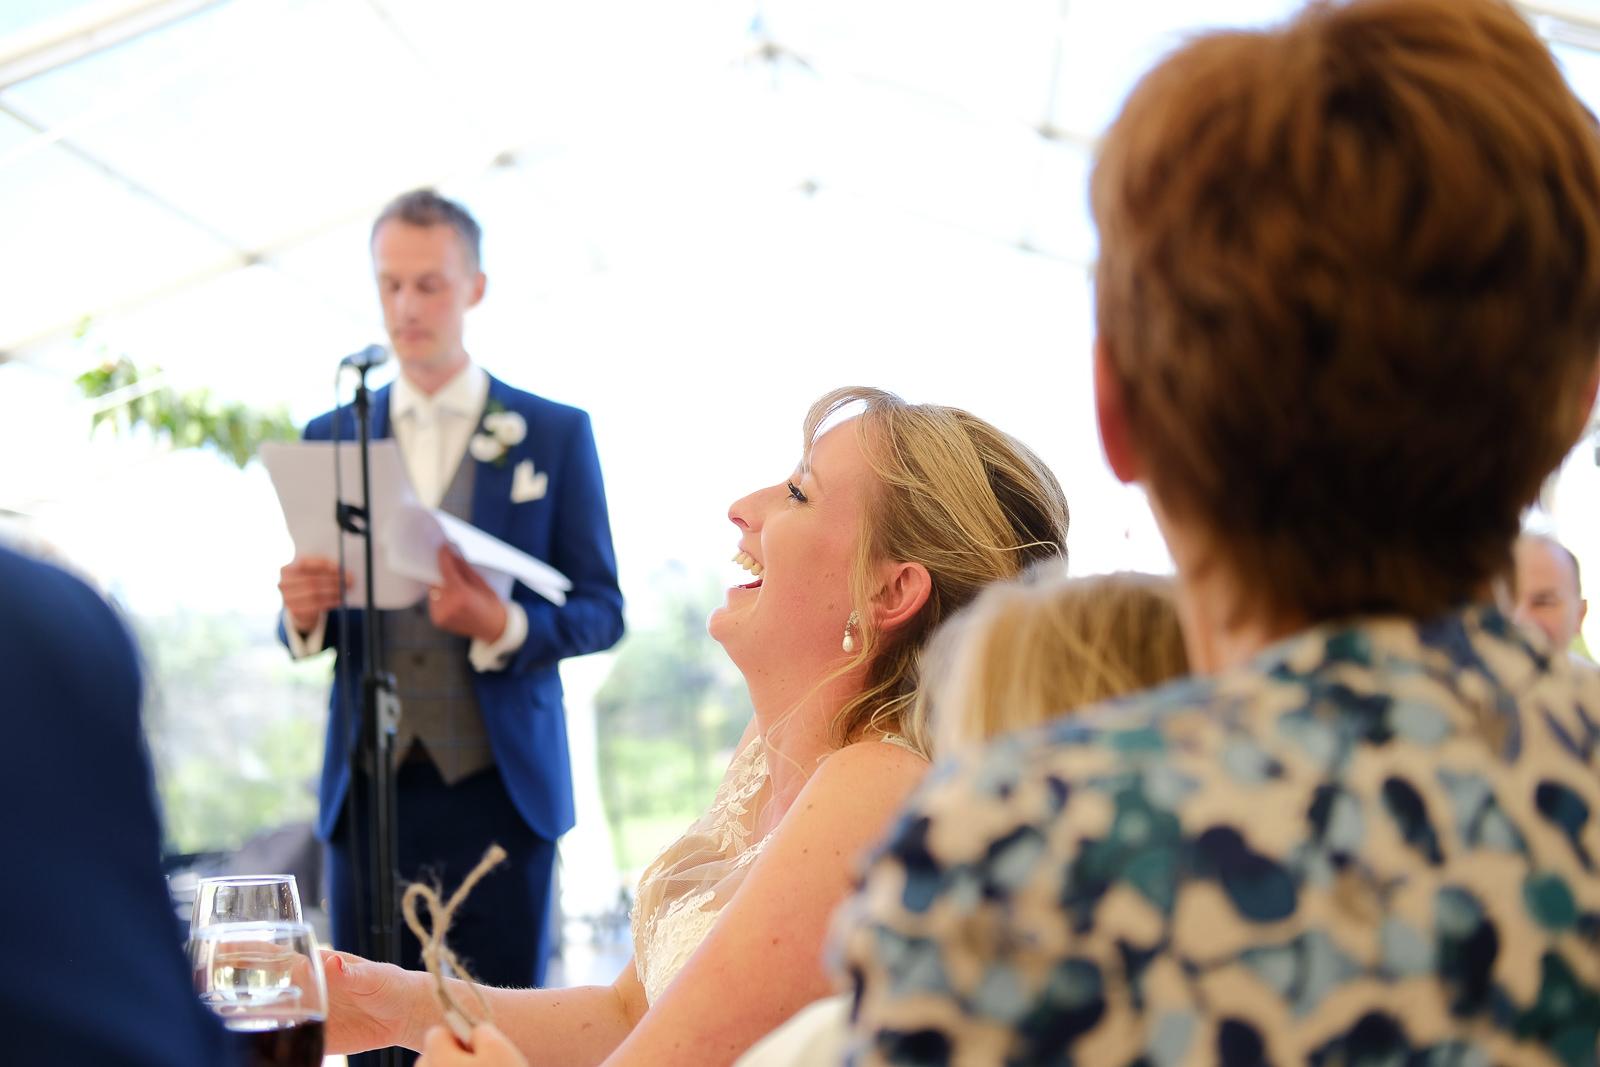 Roscarrock Farm wedding in Cornwall 057.jpg